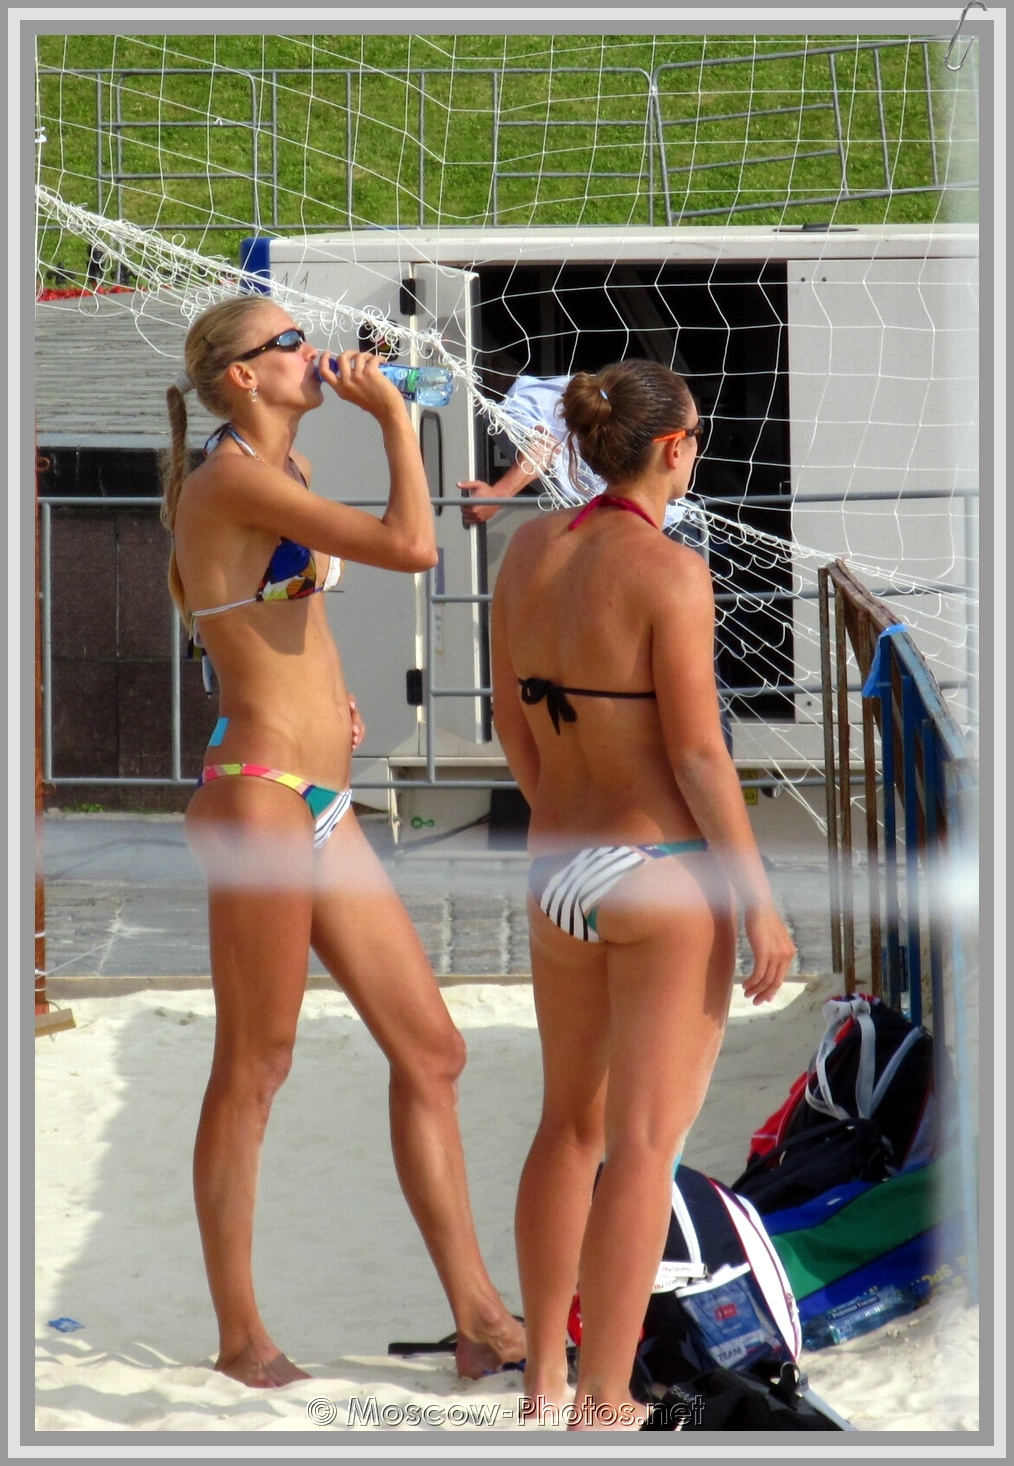 Anastasia Vasina & Anna Vozakova & Hot Moscow Summer